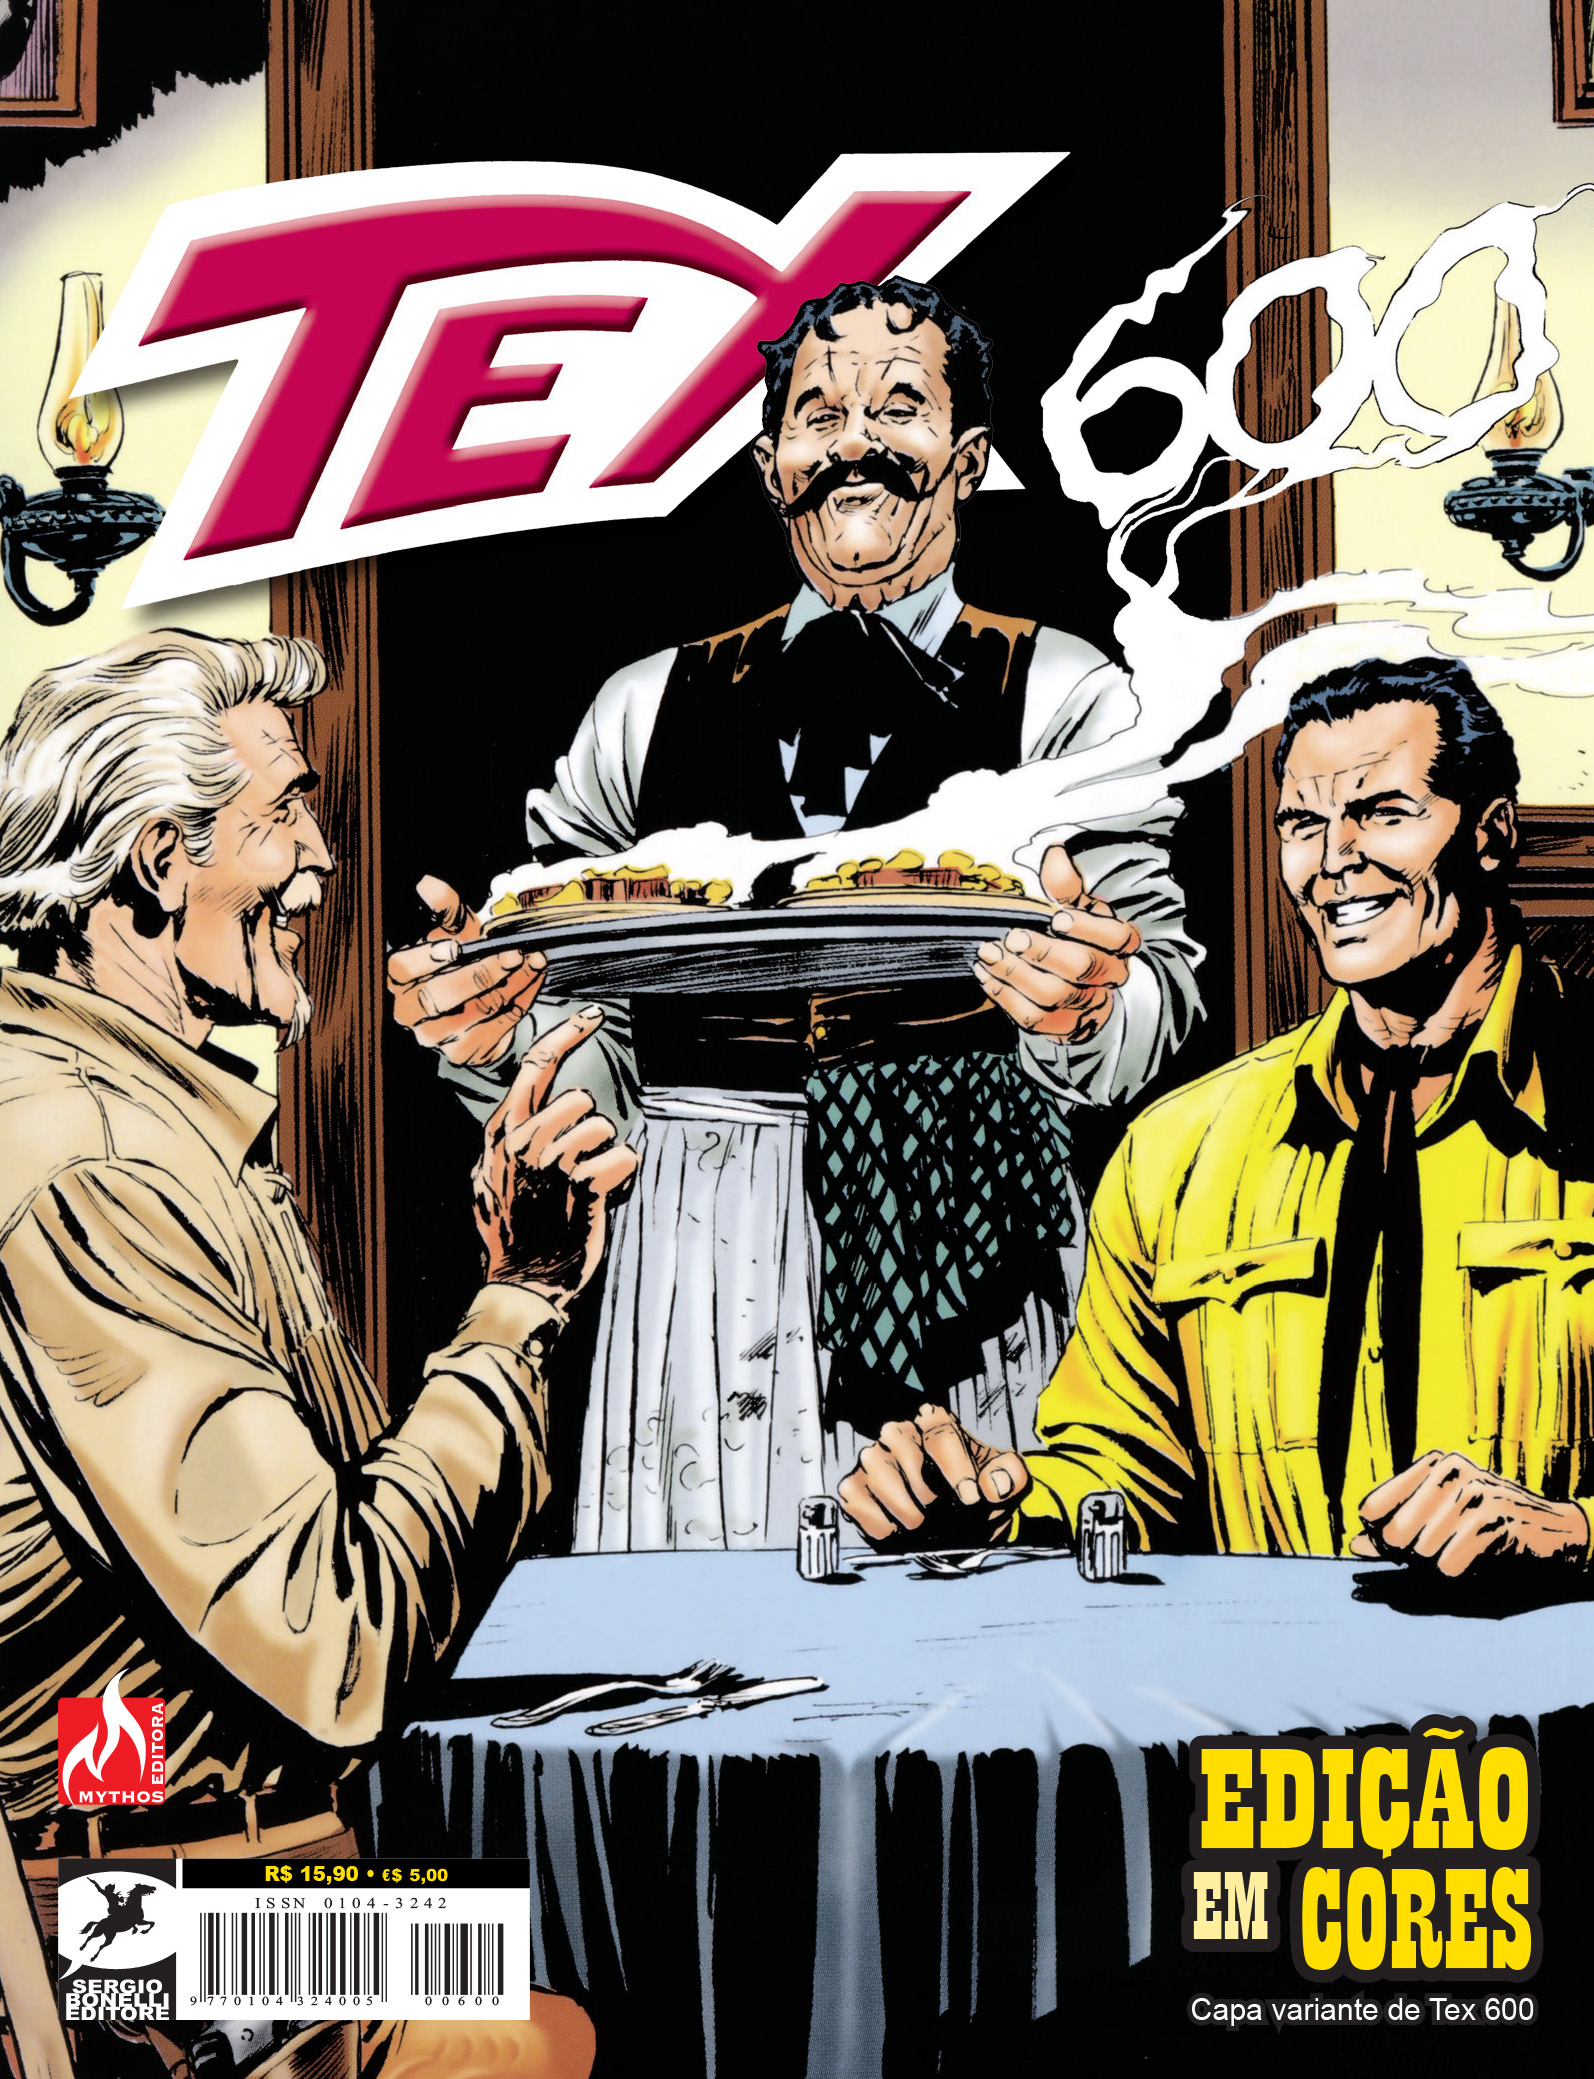 TEX Nº 600 CAPA VARIANTE